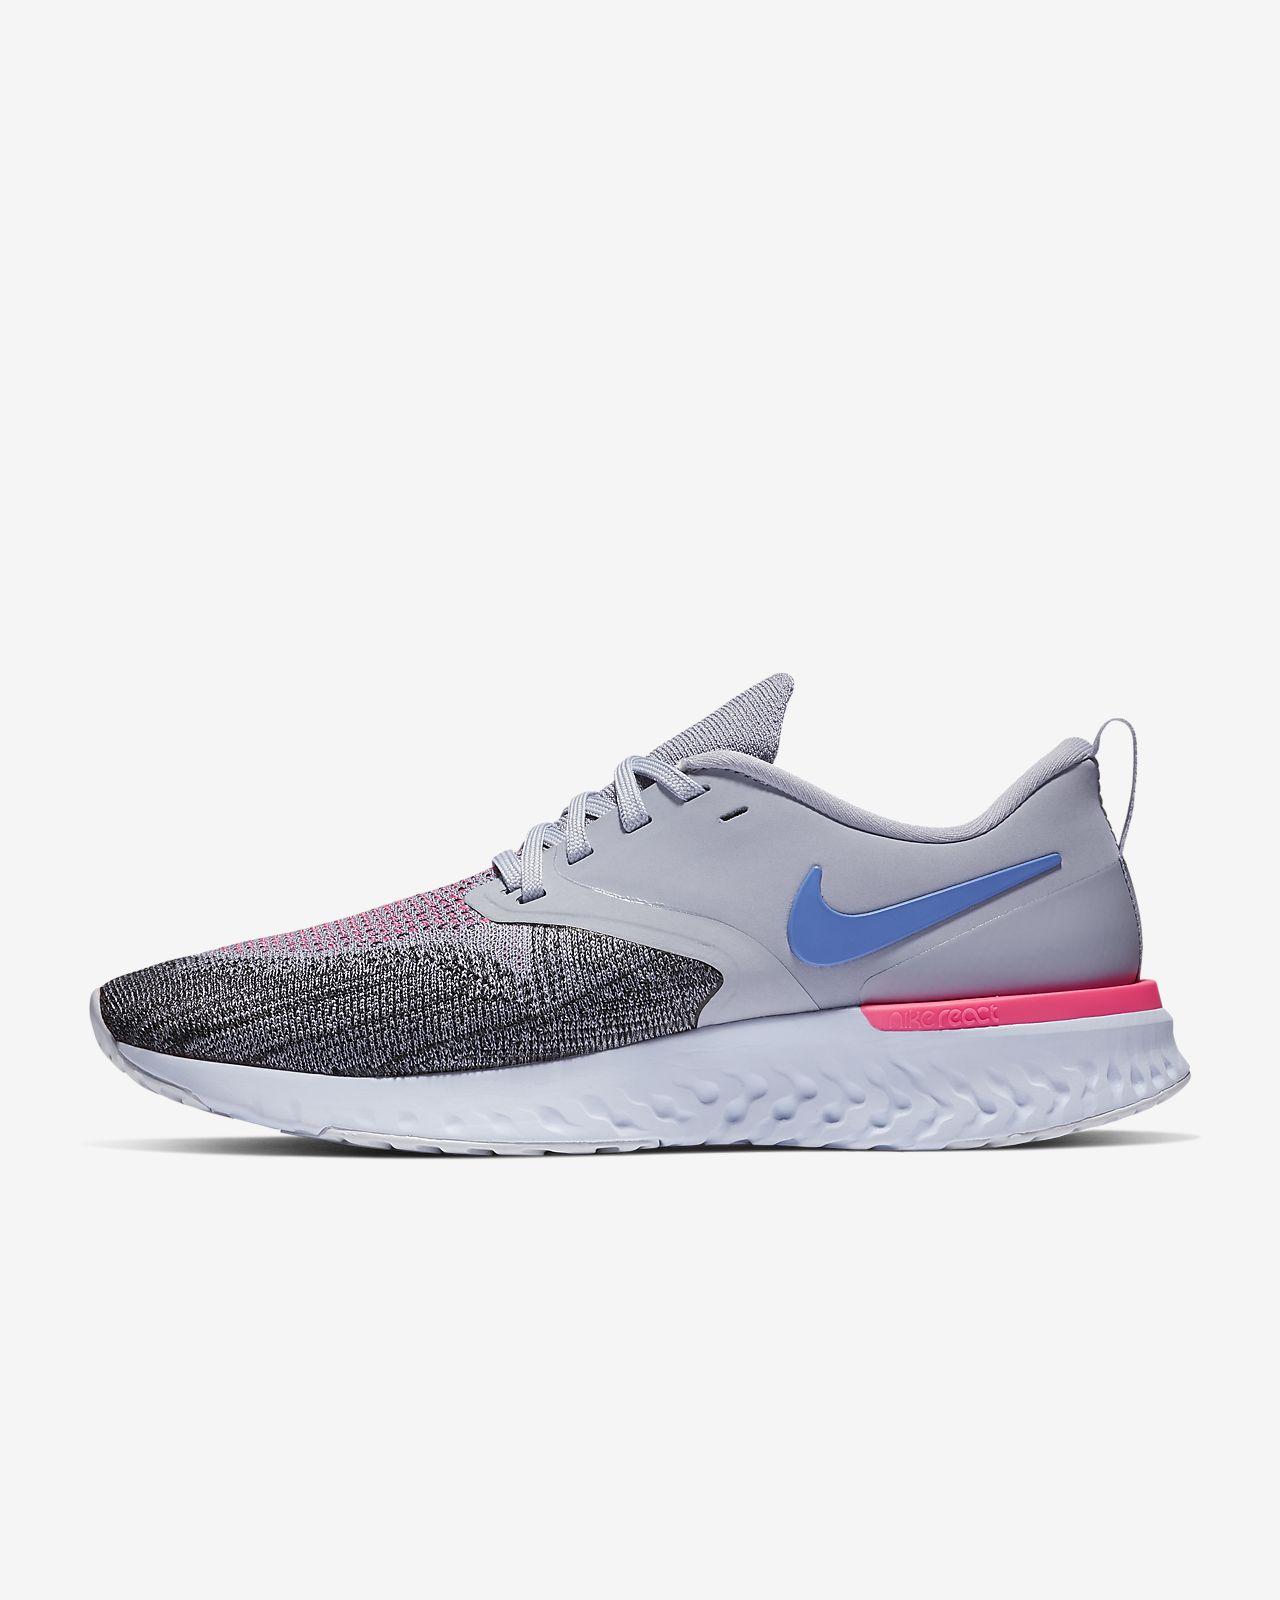 online store b2e2b e6aaa Women s Running Shoe. Nike Odyssey React Flyknit 2